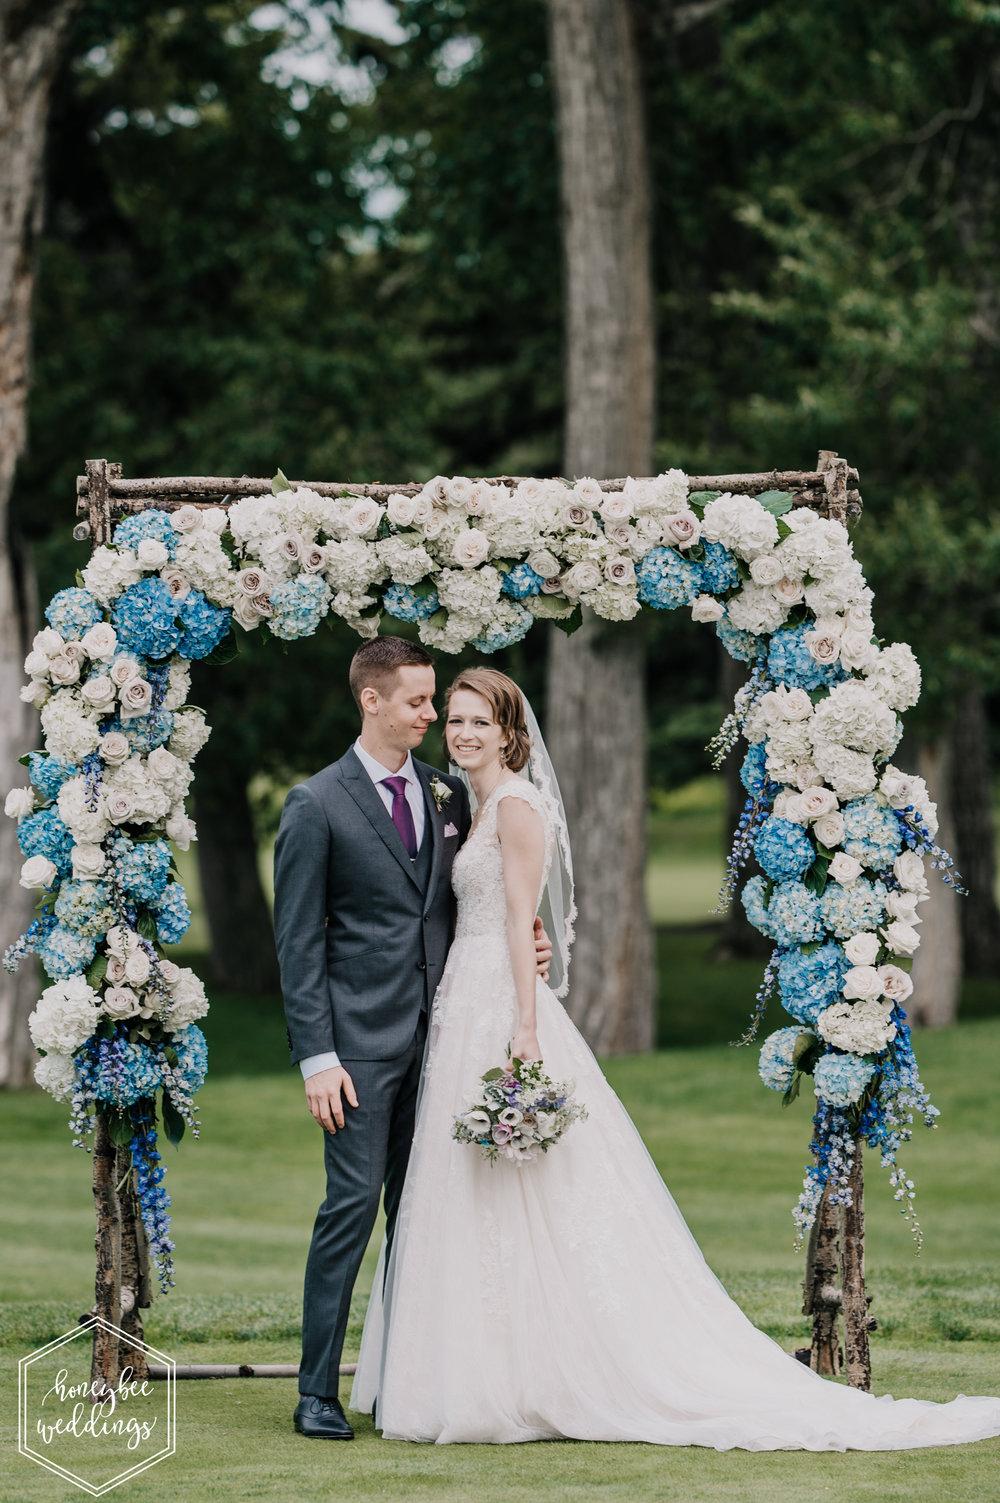 842 Riverside Country Club Wedding_Montana Wedding Photographer_Lauren Jackson + Evan Ivaldi 2018-6845.jpg